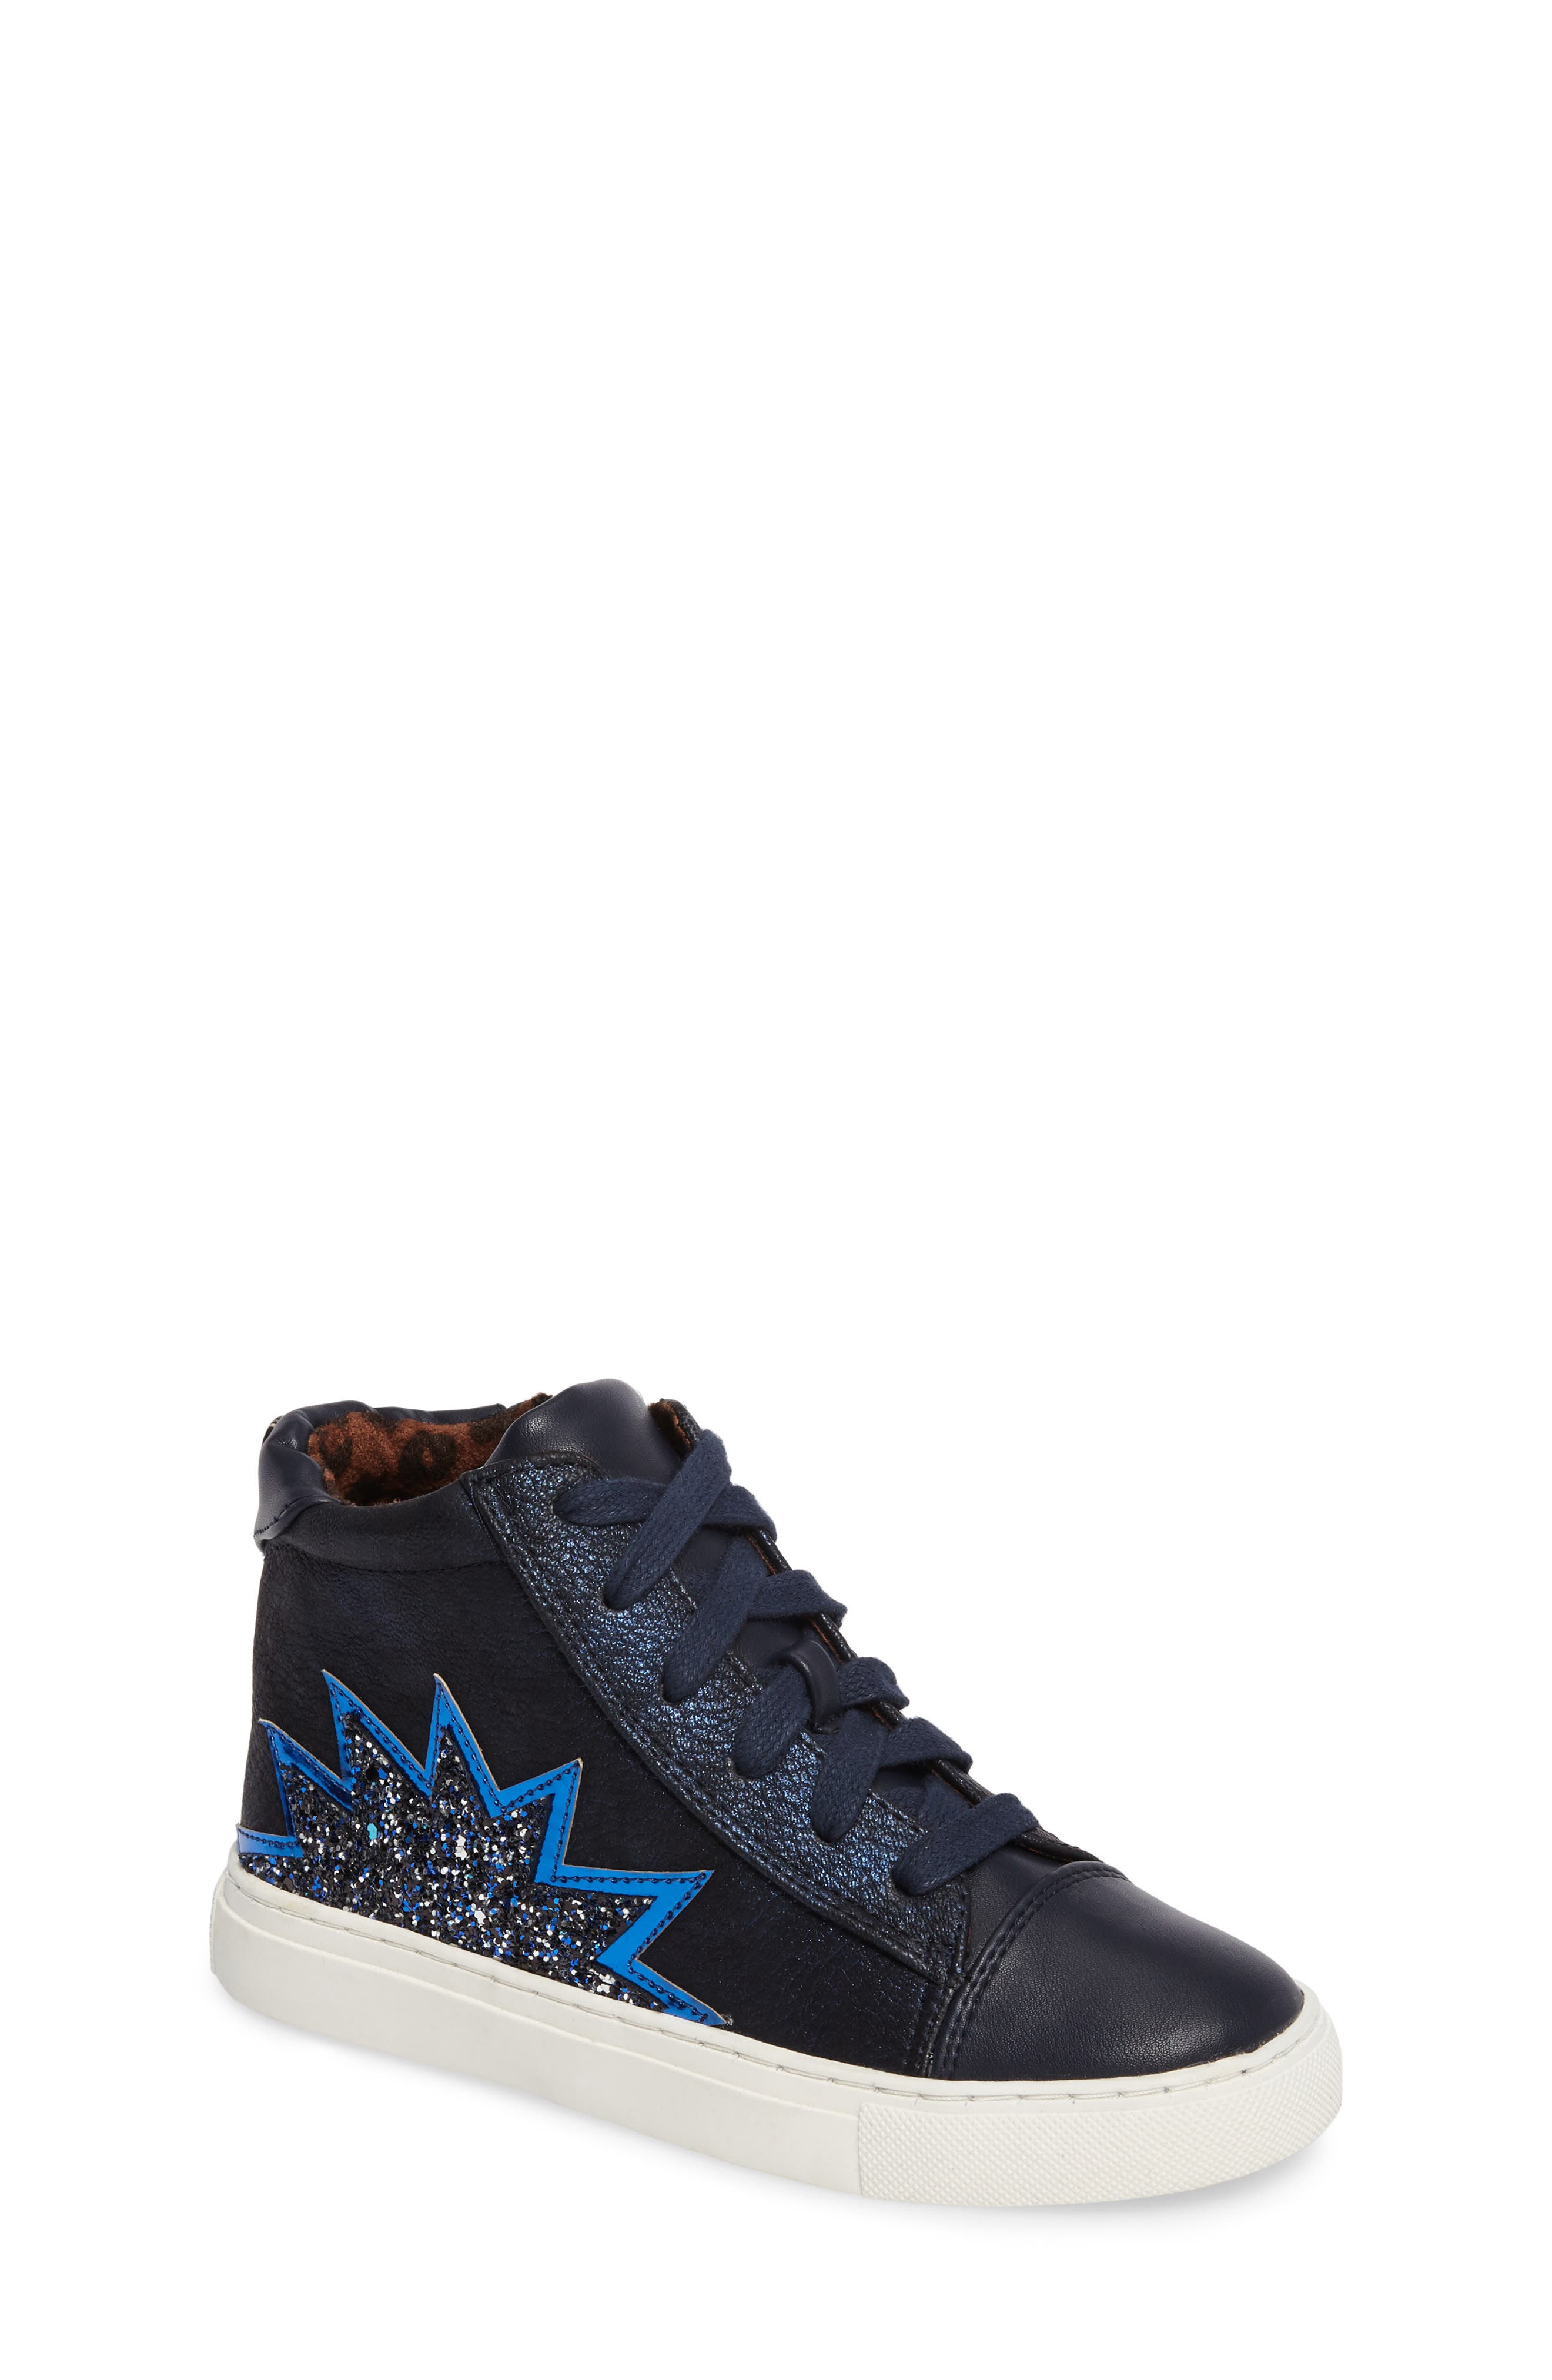 Jflash Glitter Star High Top Sneaker,                             Main thumbnail 1, color,                             438